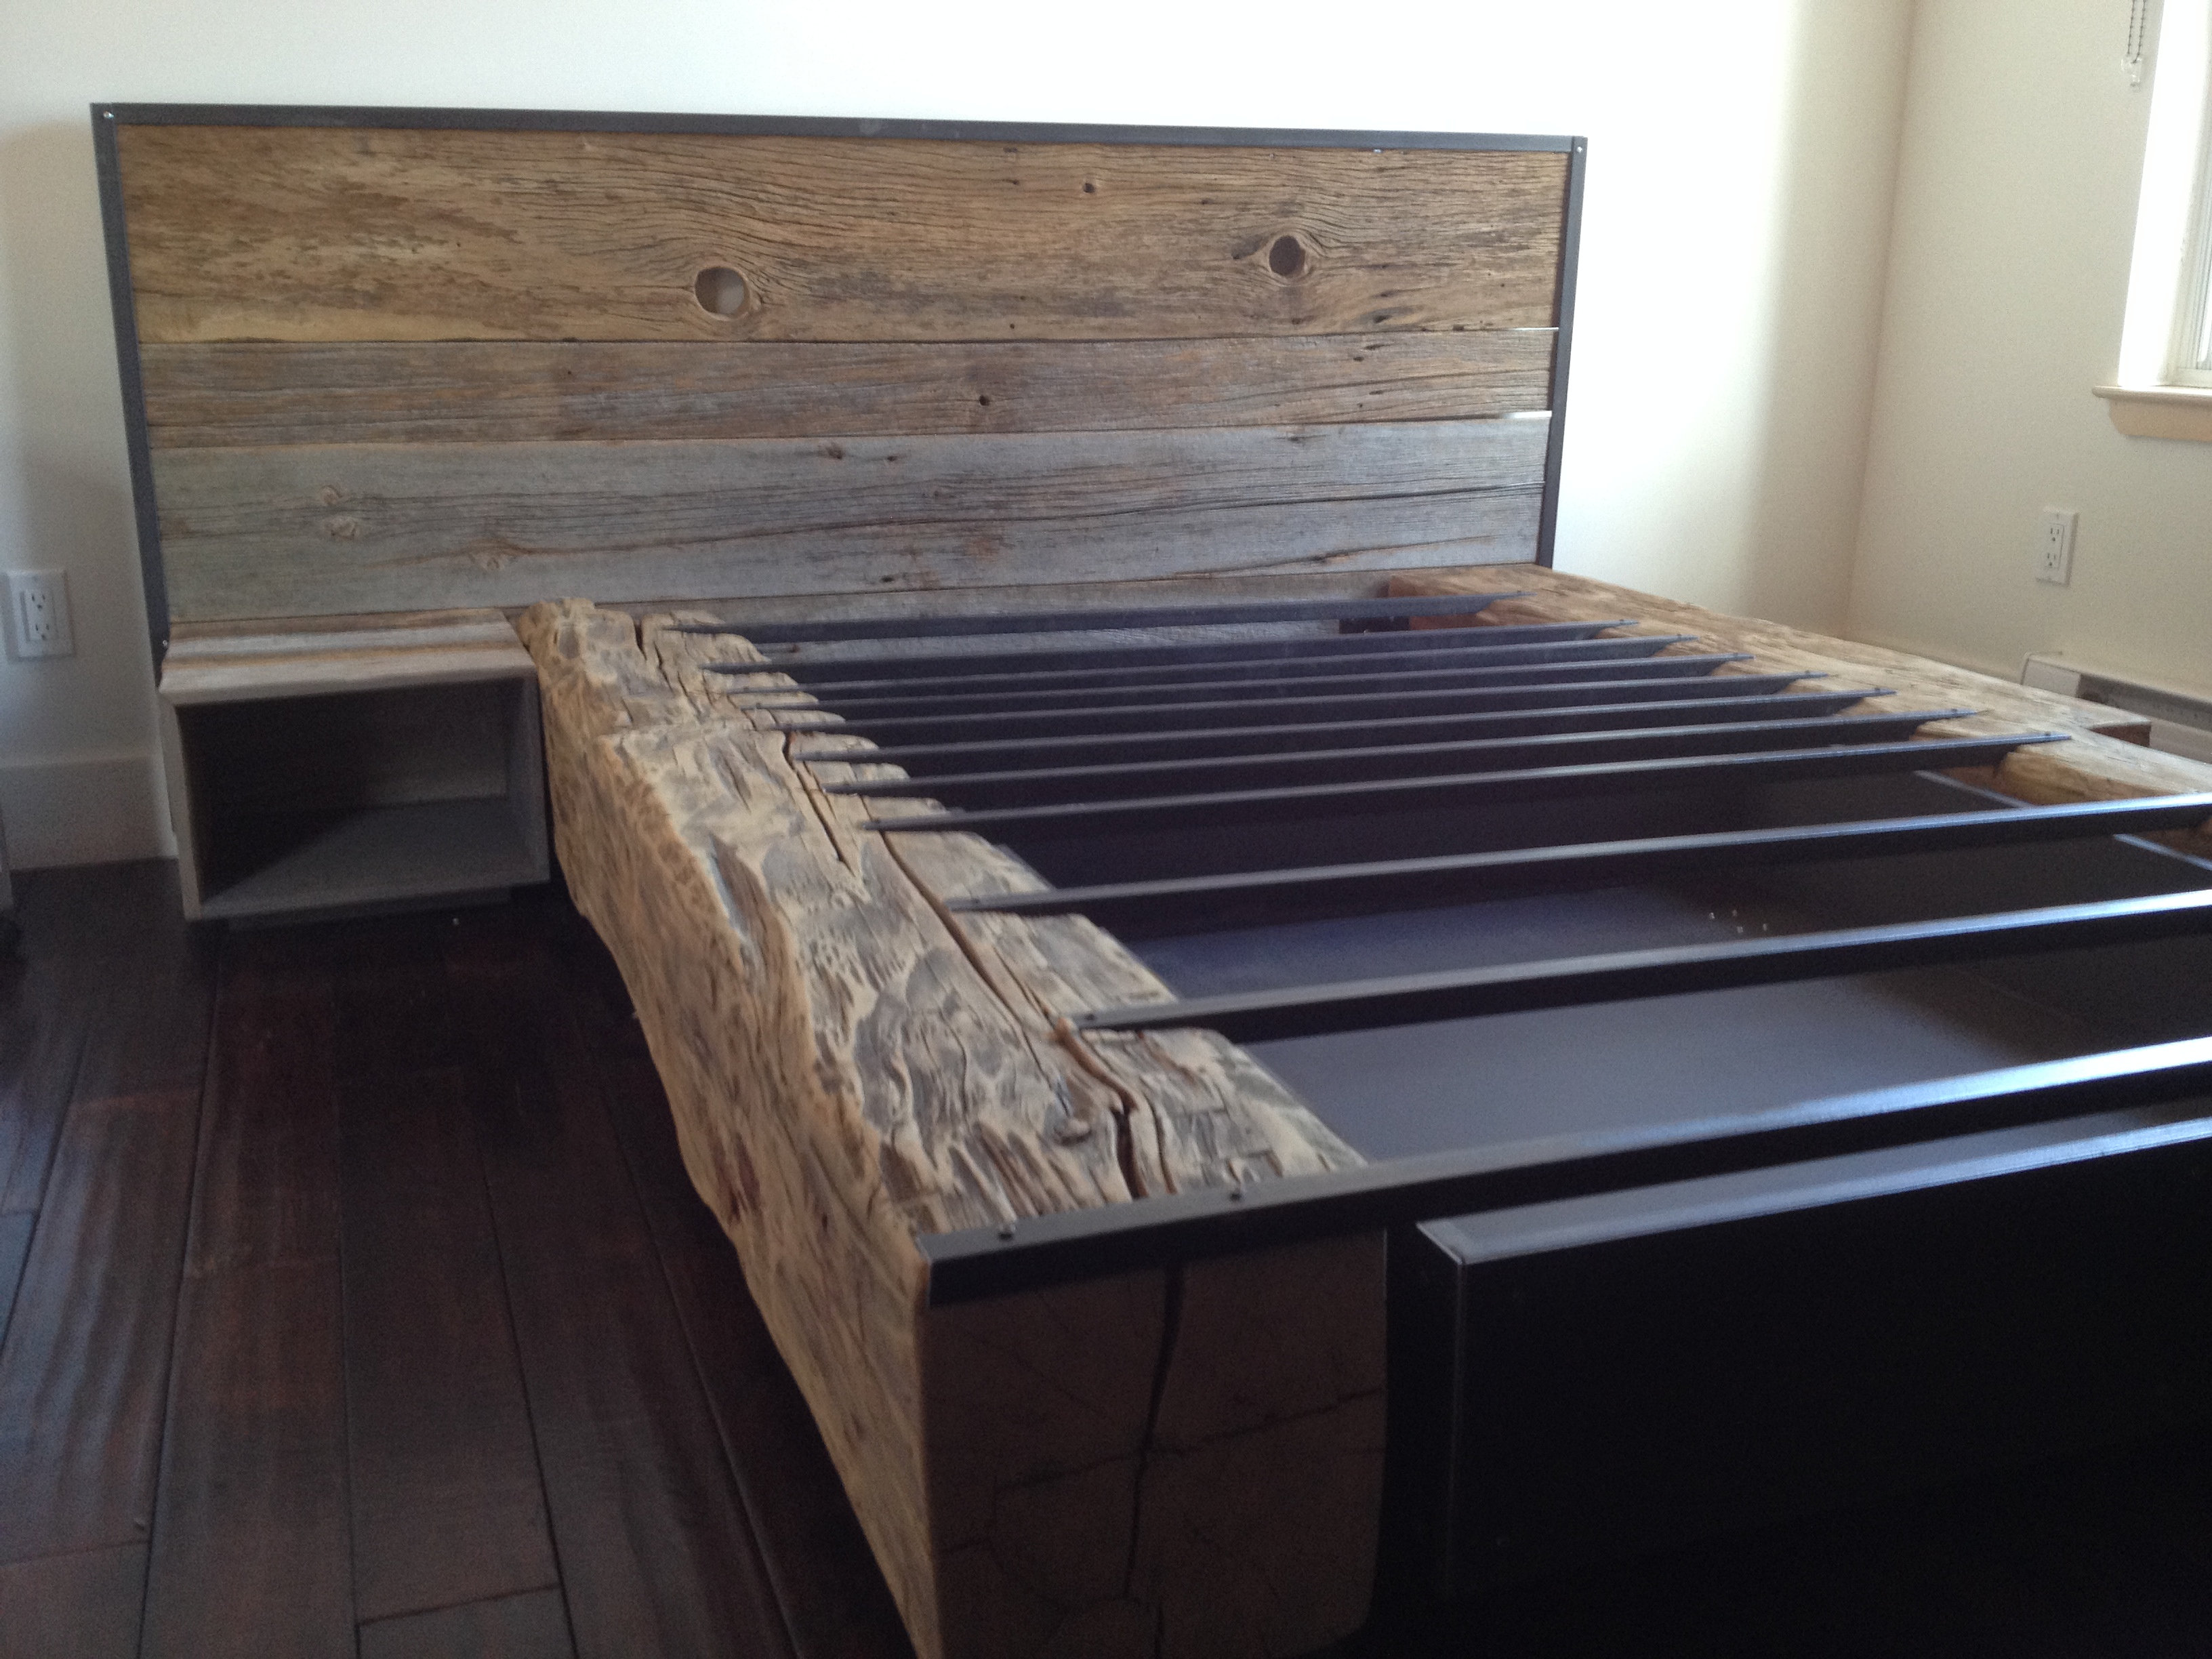 Atelierlovasi lit queen bois de grange - Table de chevet en fer ...